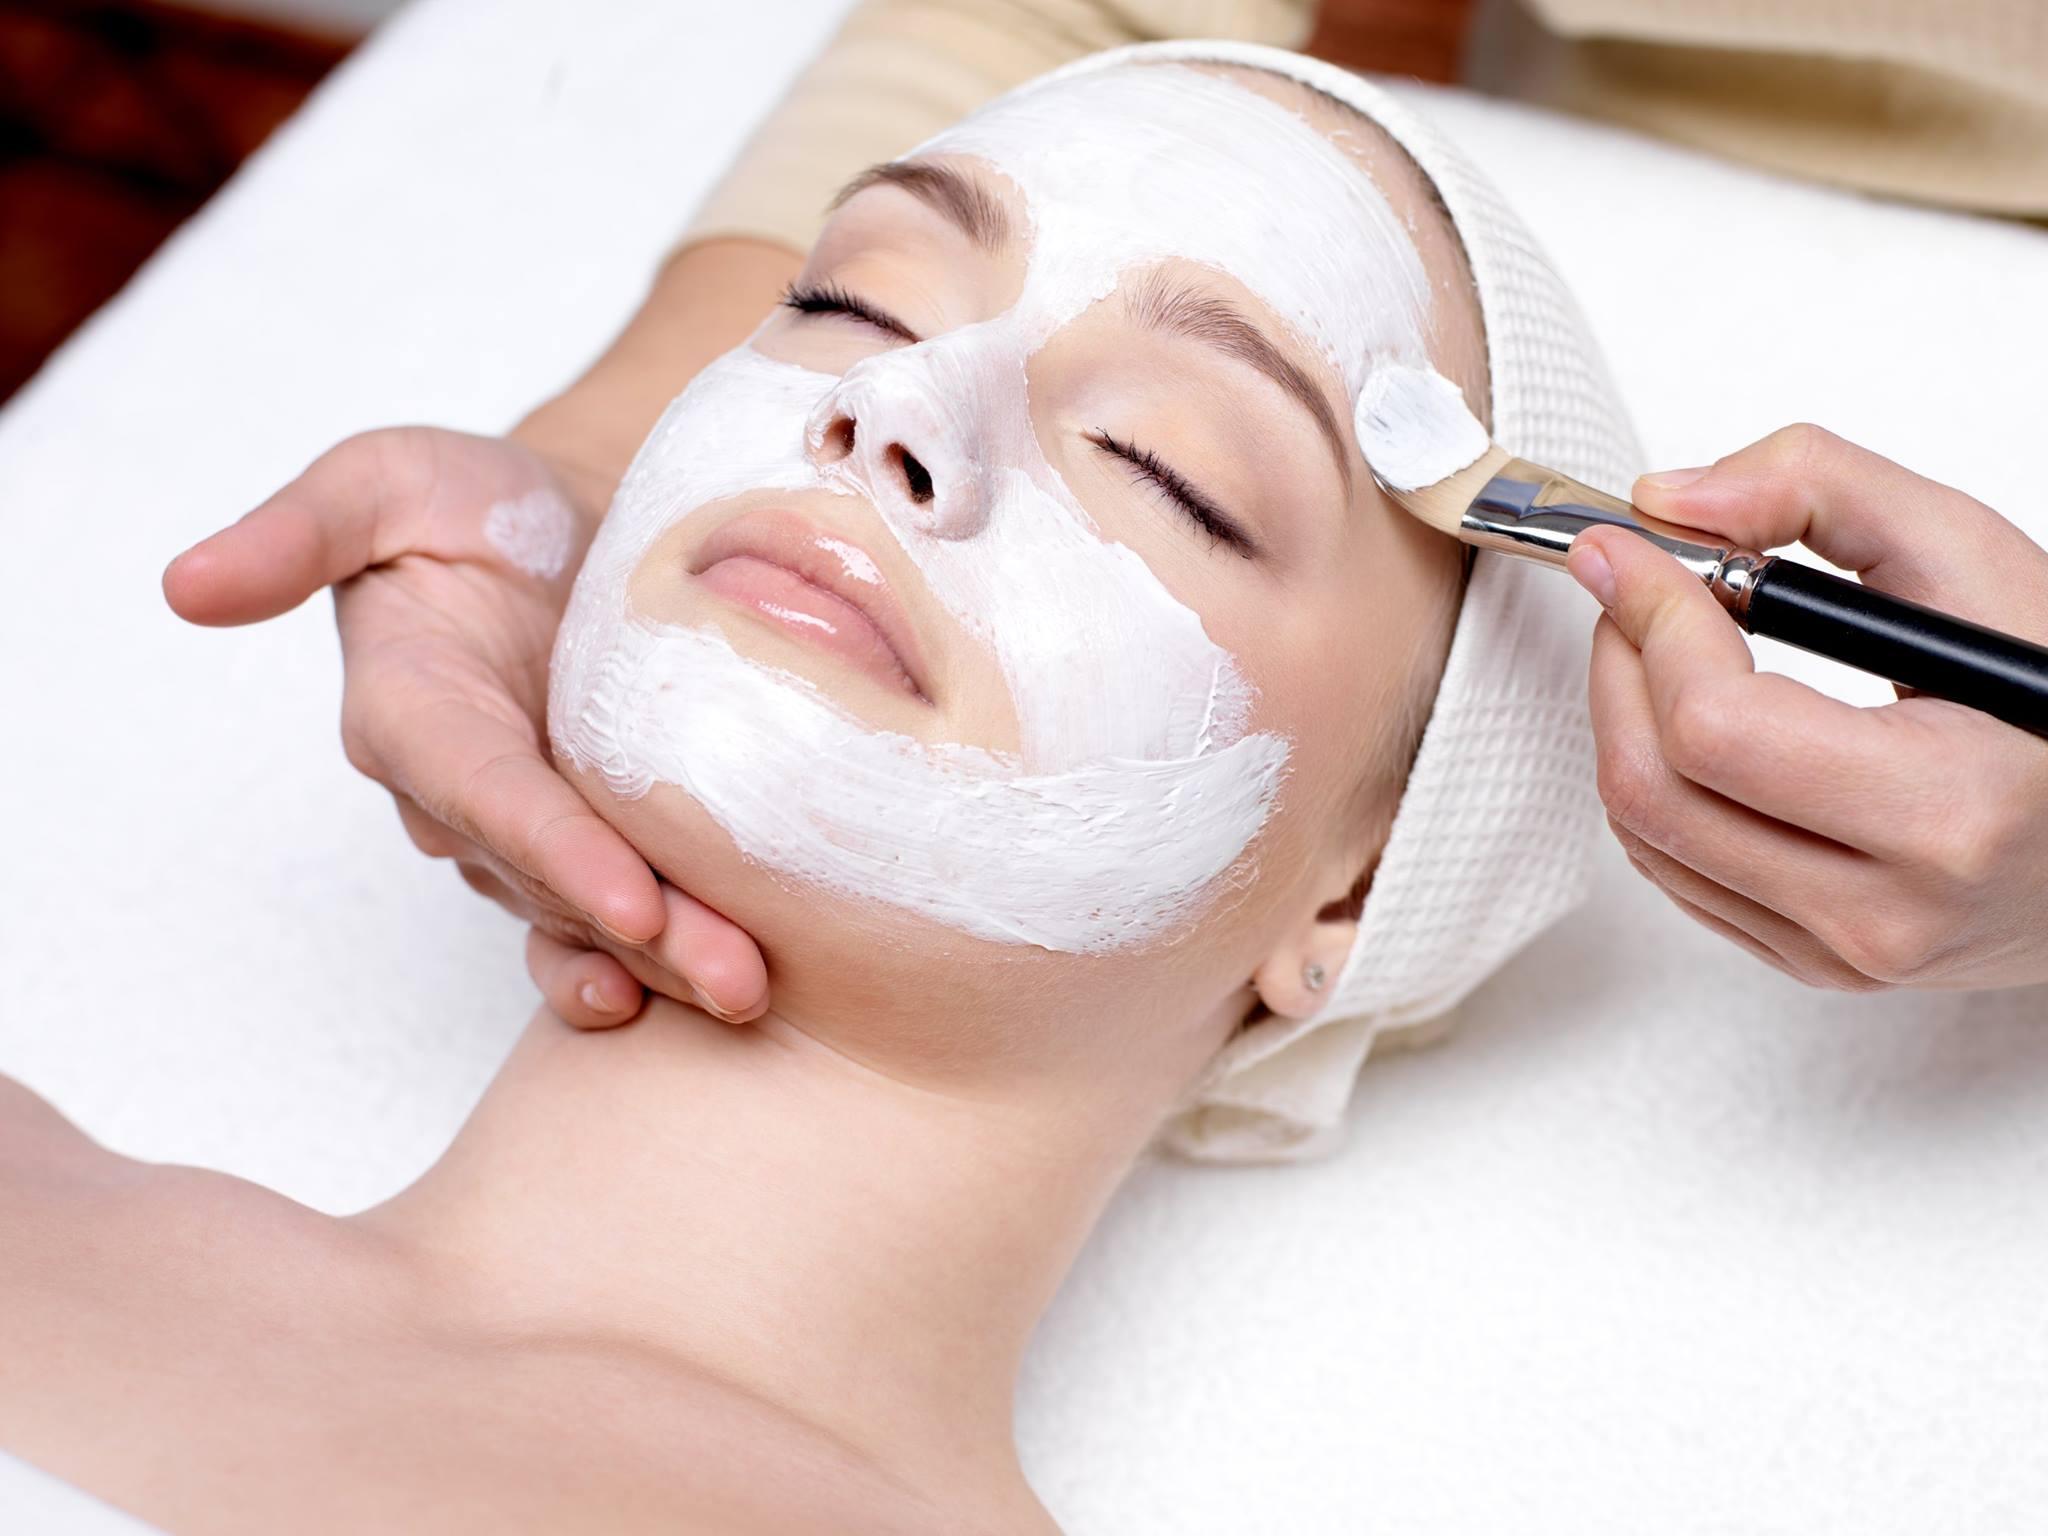 pulizia del viso a casa